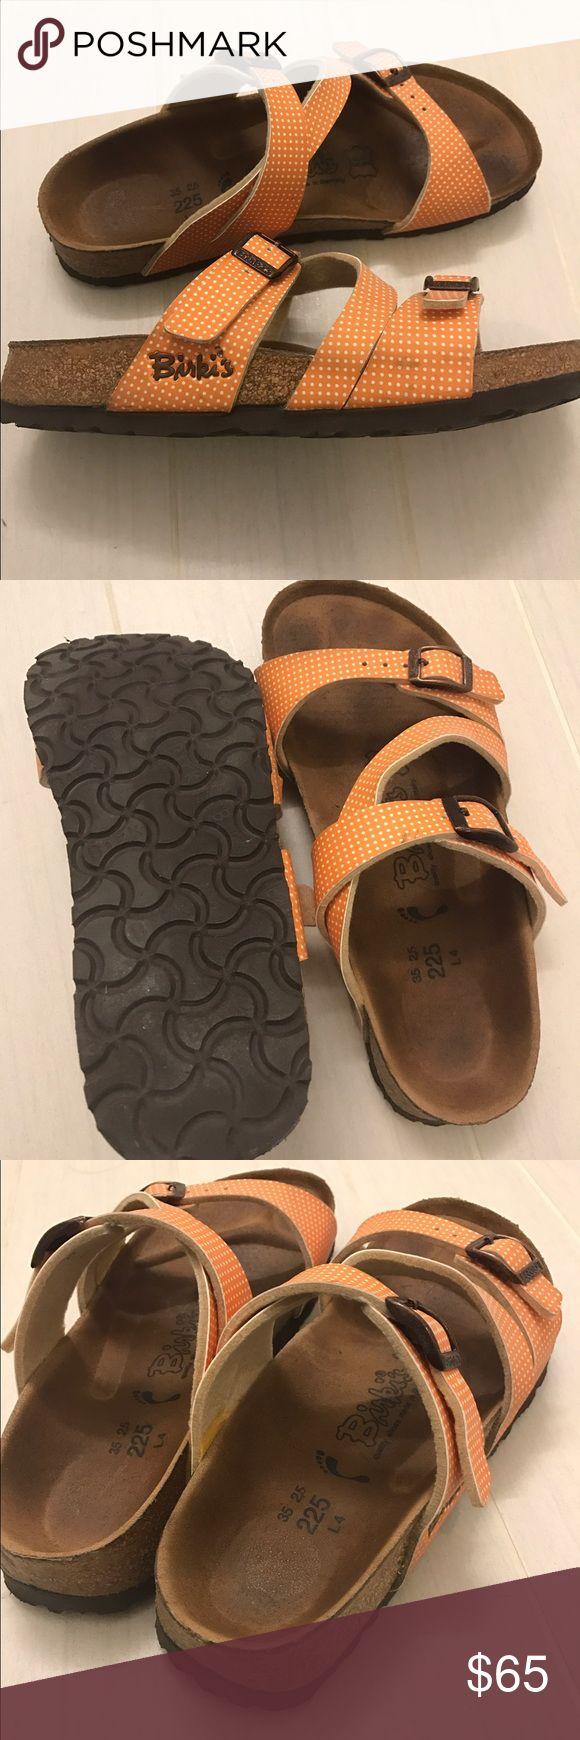 Orange Birkenstock 35 Birkenstock 35 made in Germany. Soft foot bedding. Good used condition. Birkenstock Shoes Sandals